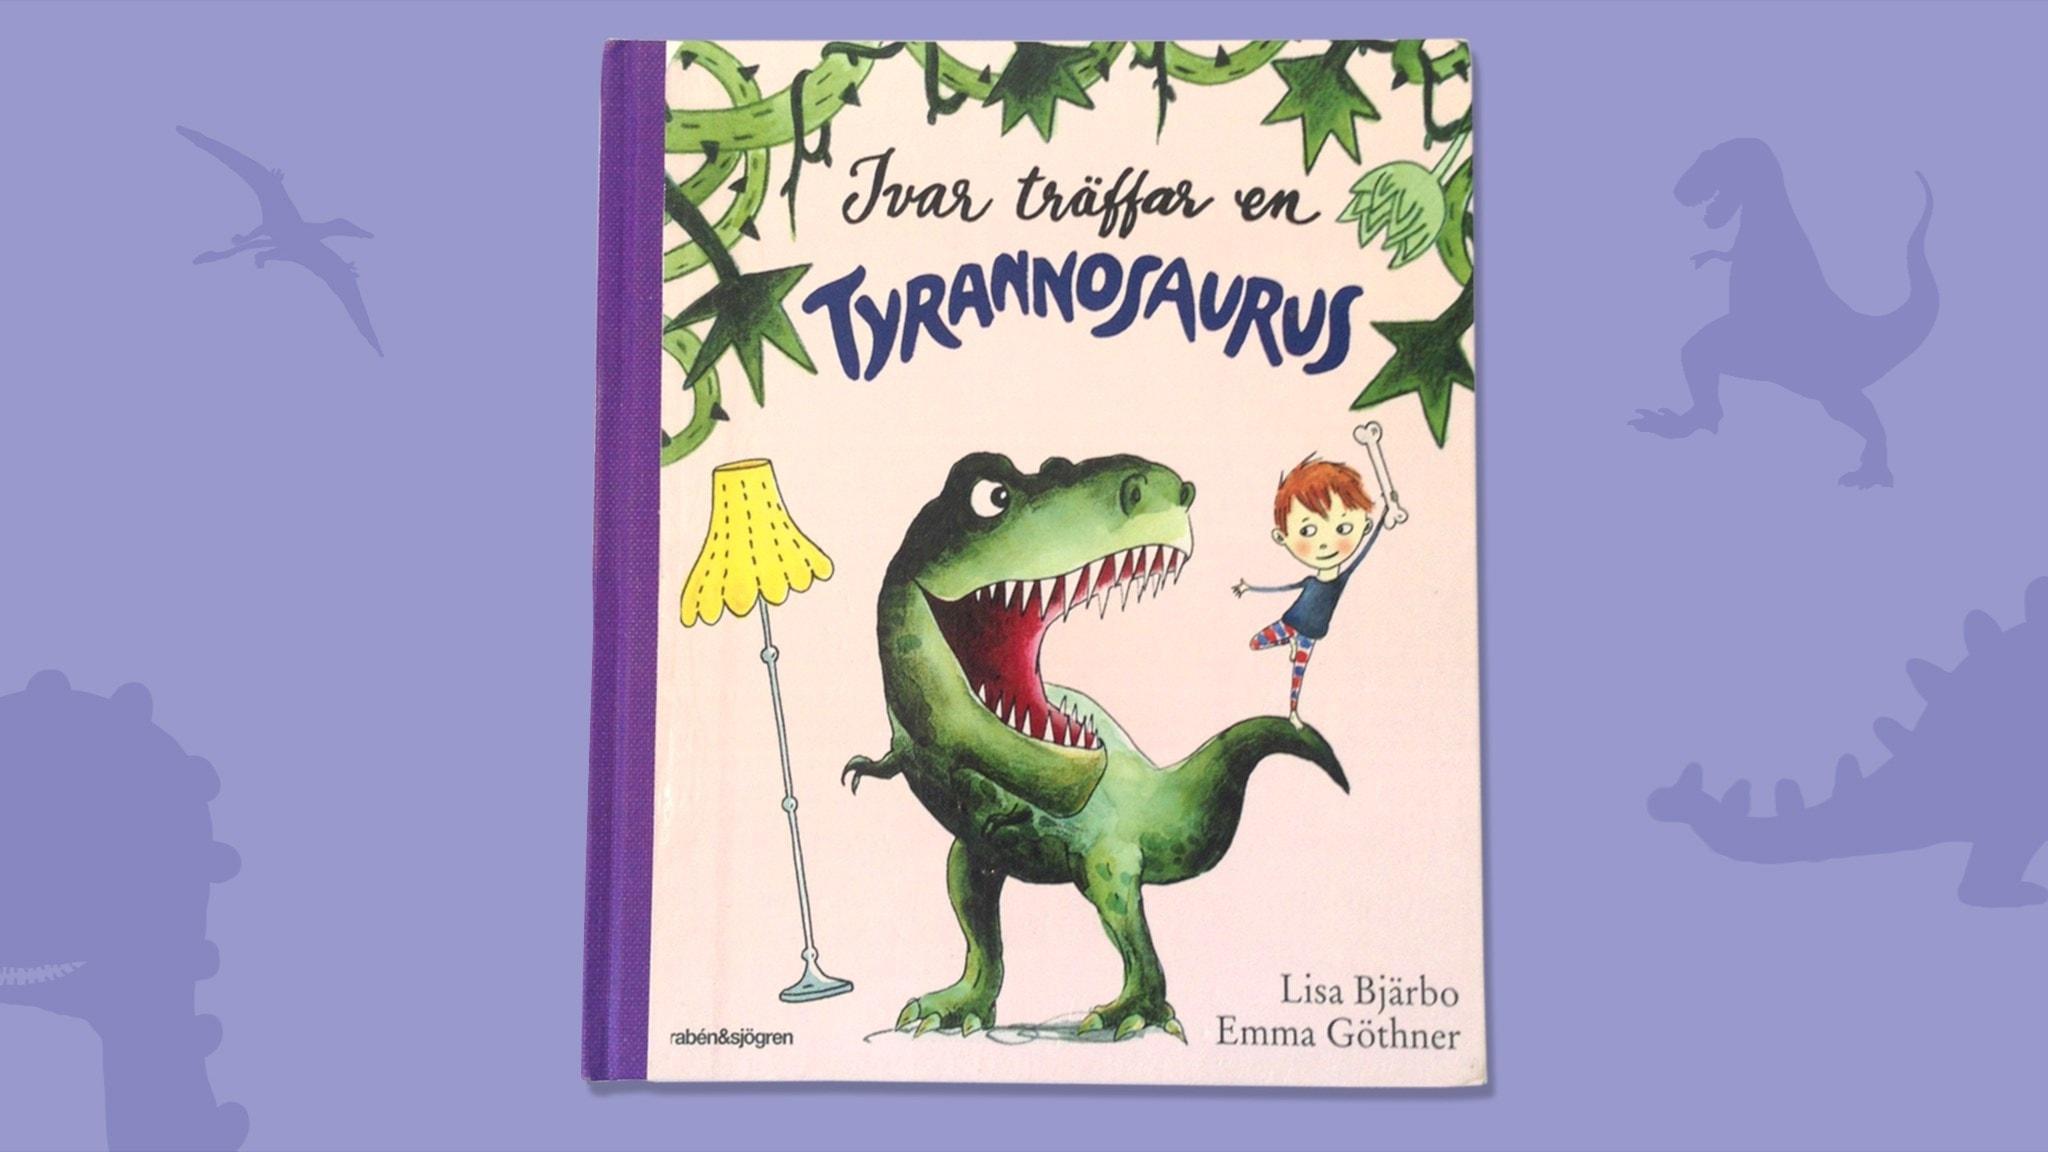 Saga: Ivar träffar en Tyrannosaurus